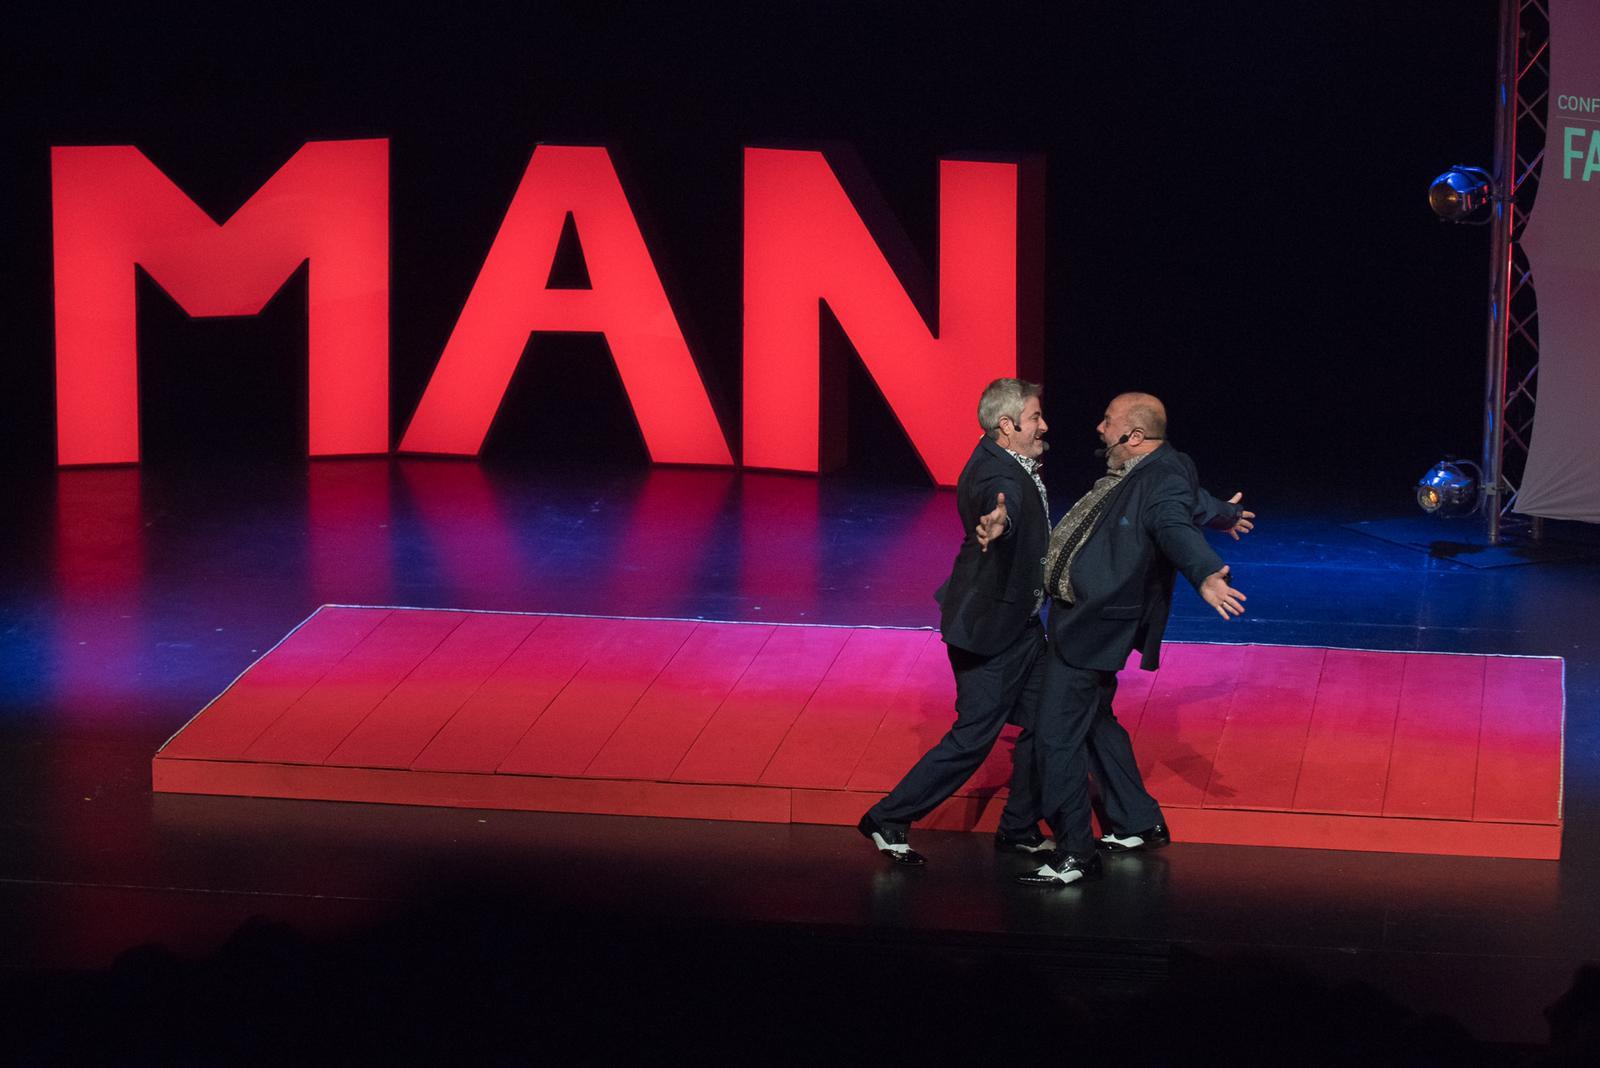 Ana Paula Rocha - Teatro - Faz-te Homem - Setembro 2018 - 002